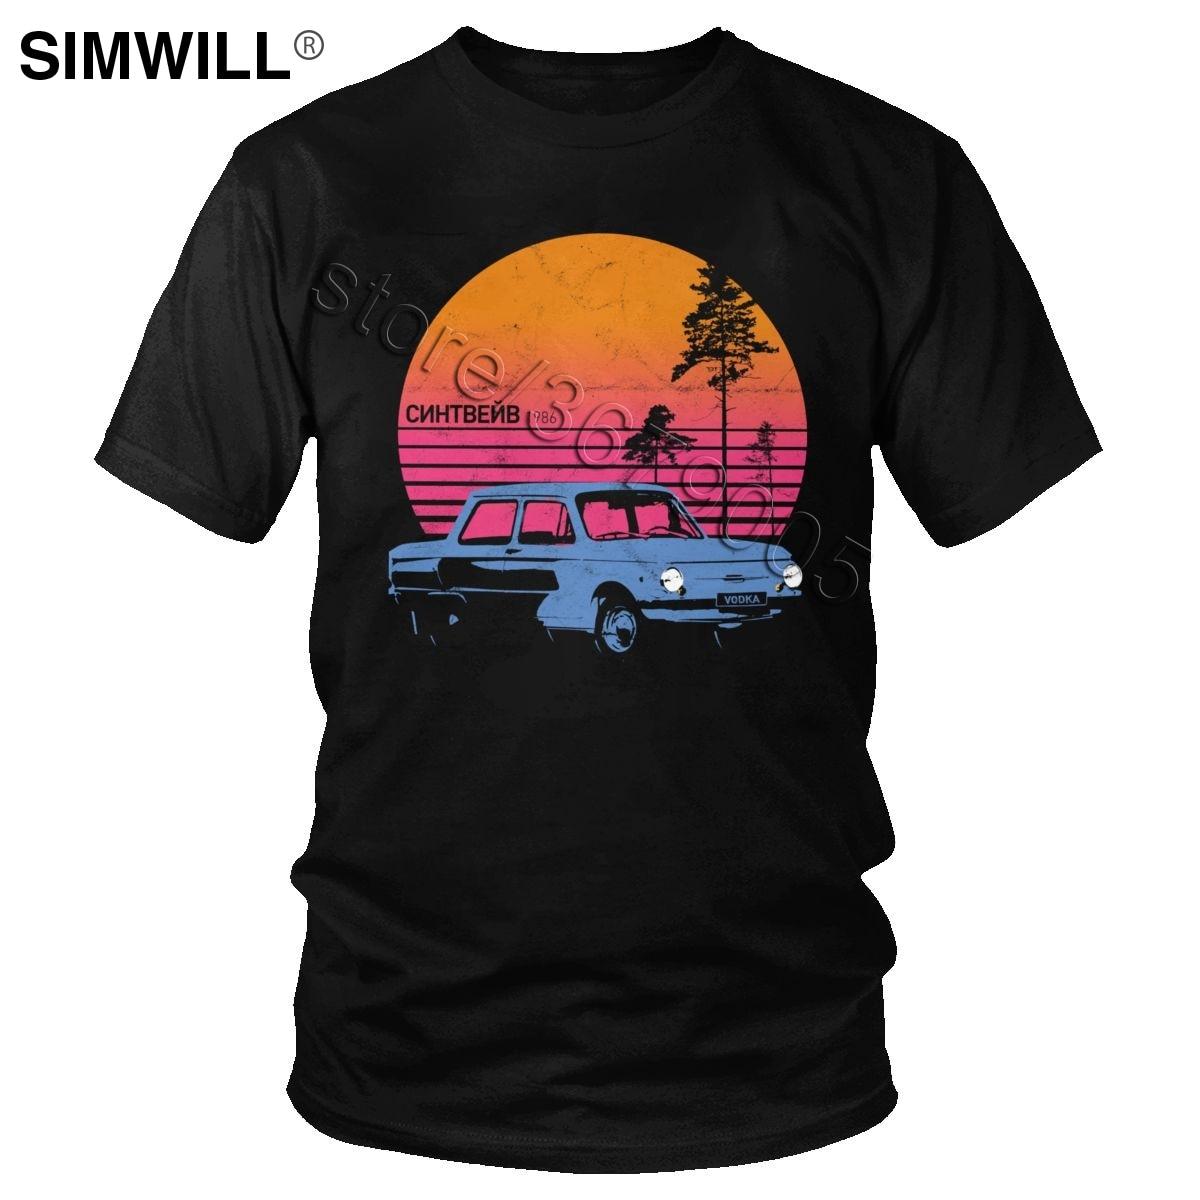 Russian Synthwave Vodka Slav Car T Shirt Classic Cotton Tee Men Short Sleeved Aesthetic Vintage Retrowave 80s Graphic T-shirt